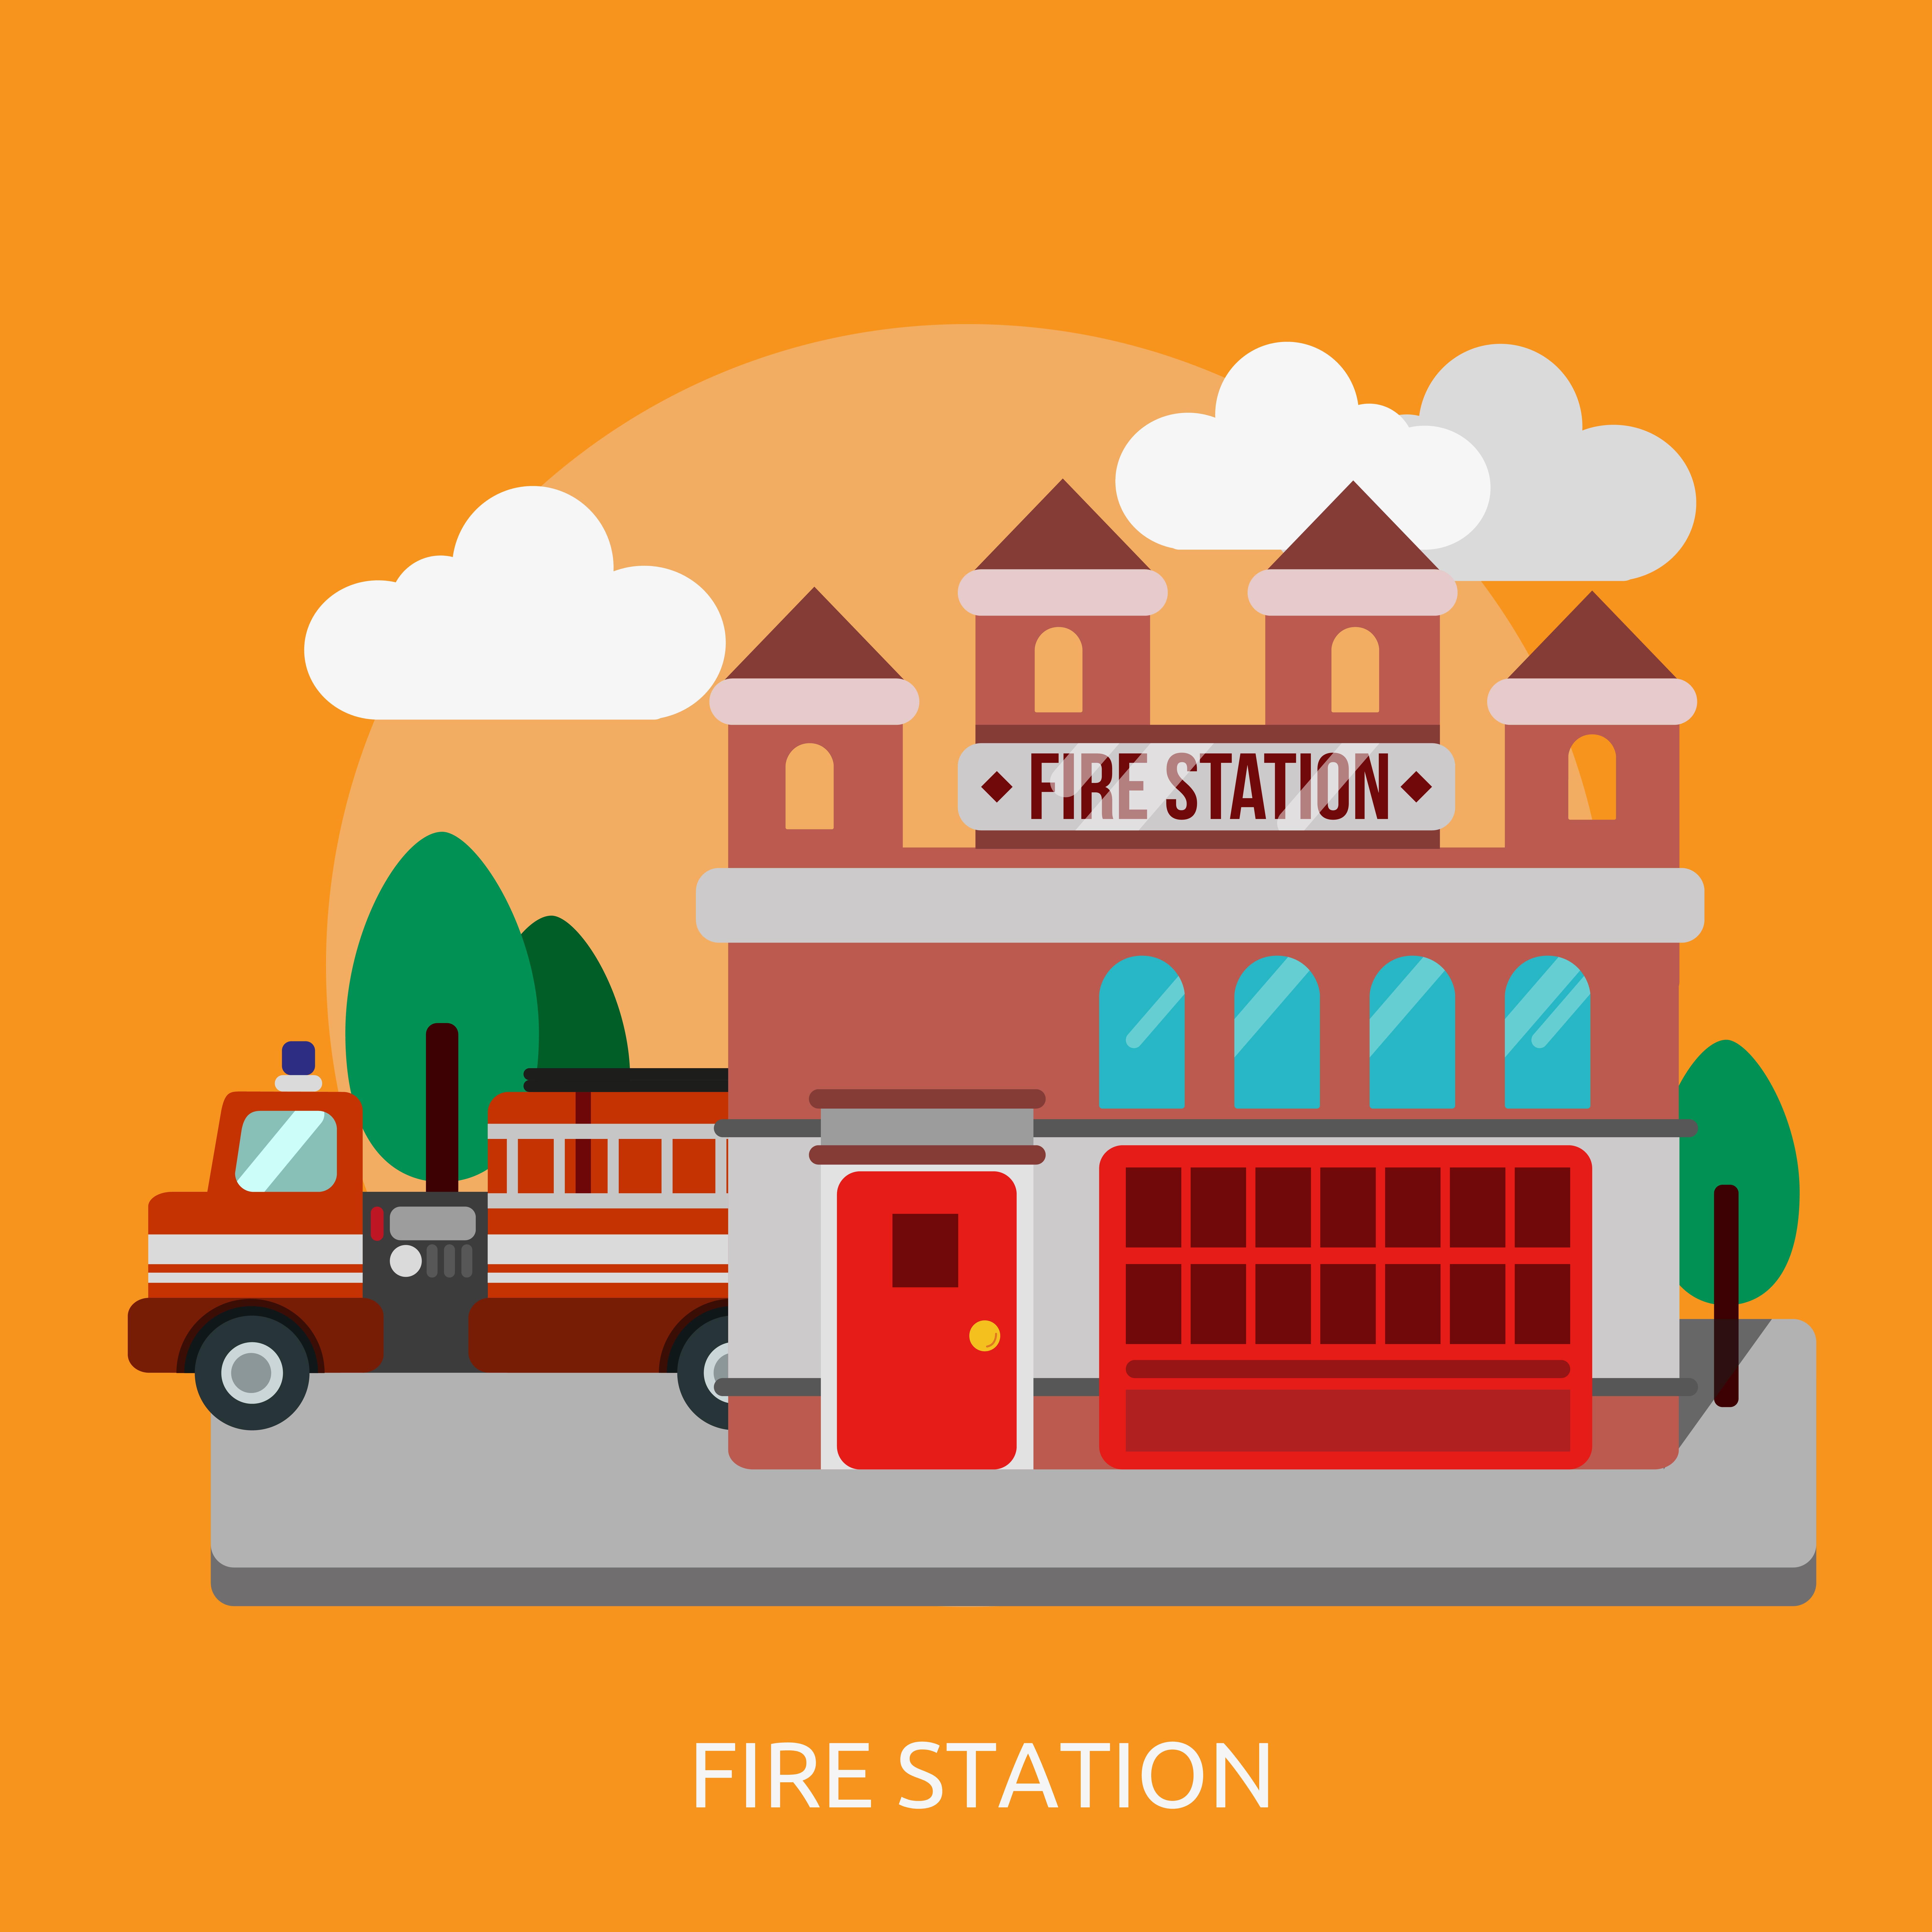 Fire Station Conceptual Illustration Design